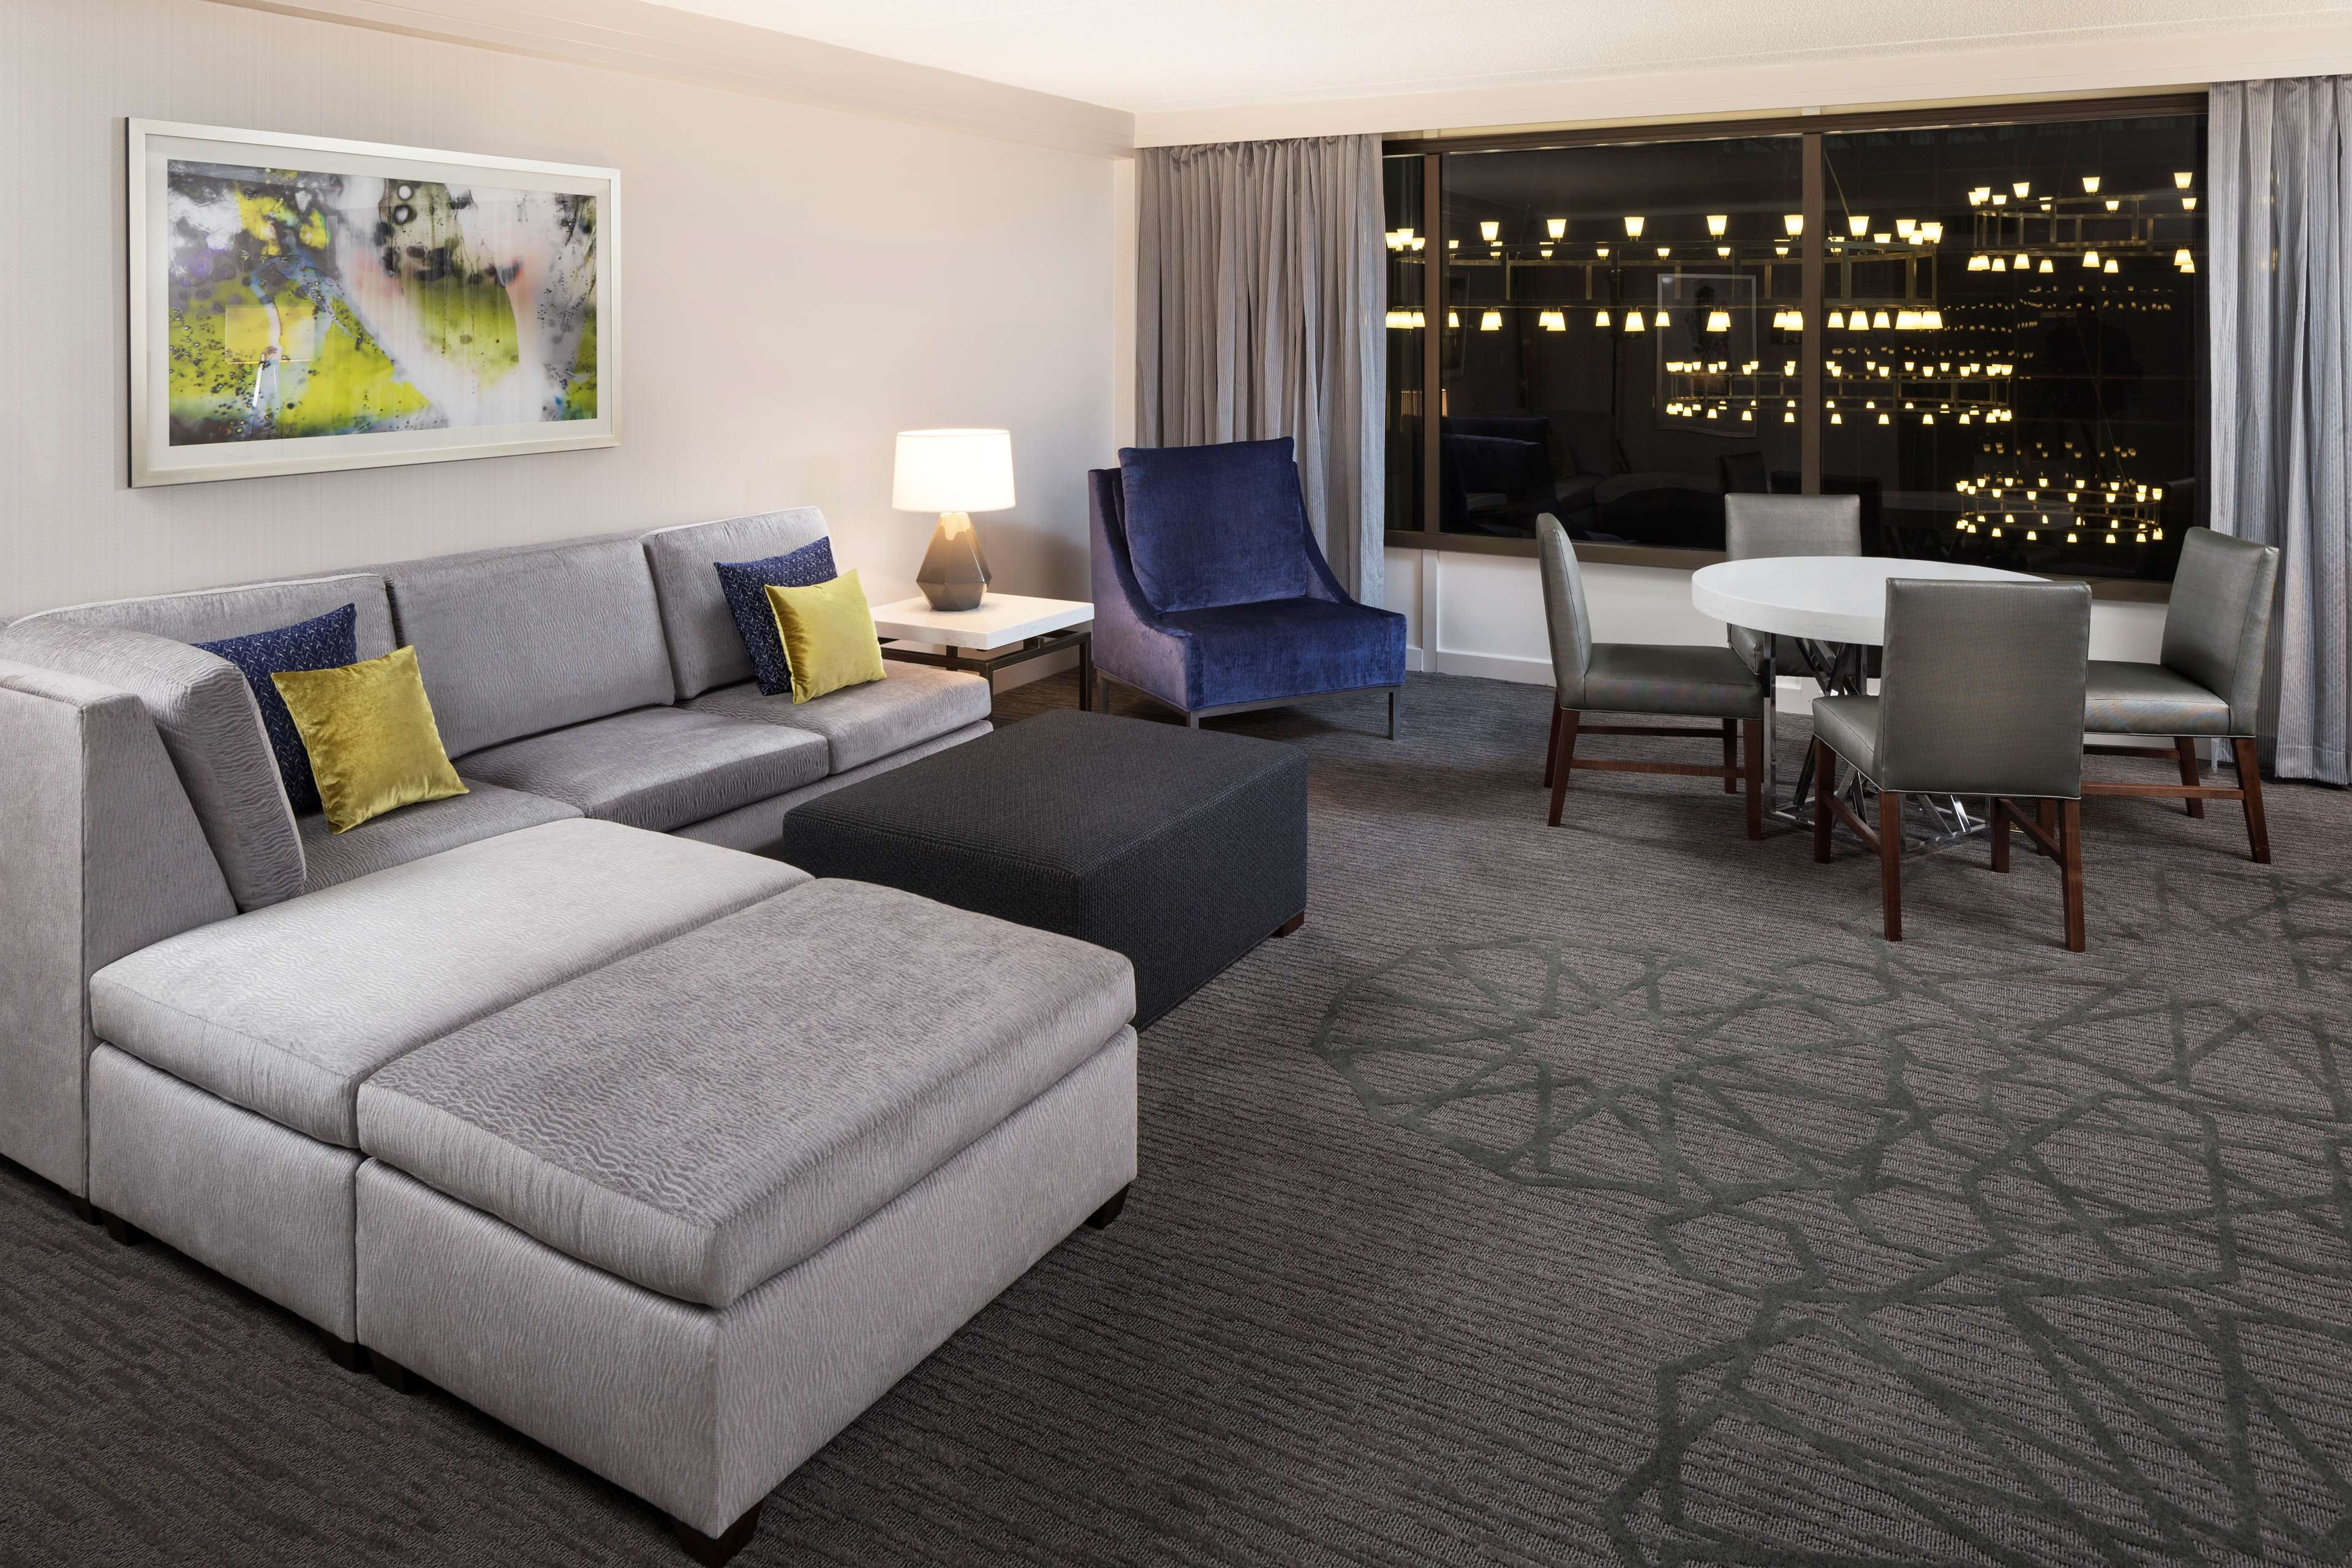 Sheraton Bloomington Hotel image 4